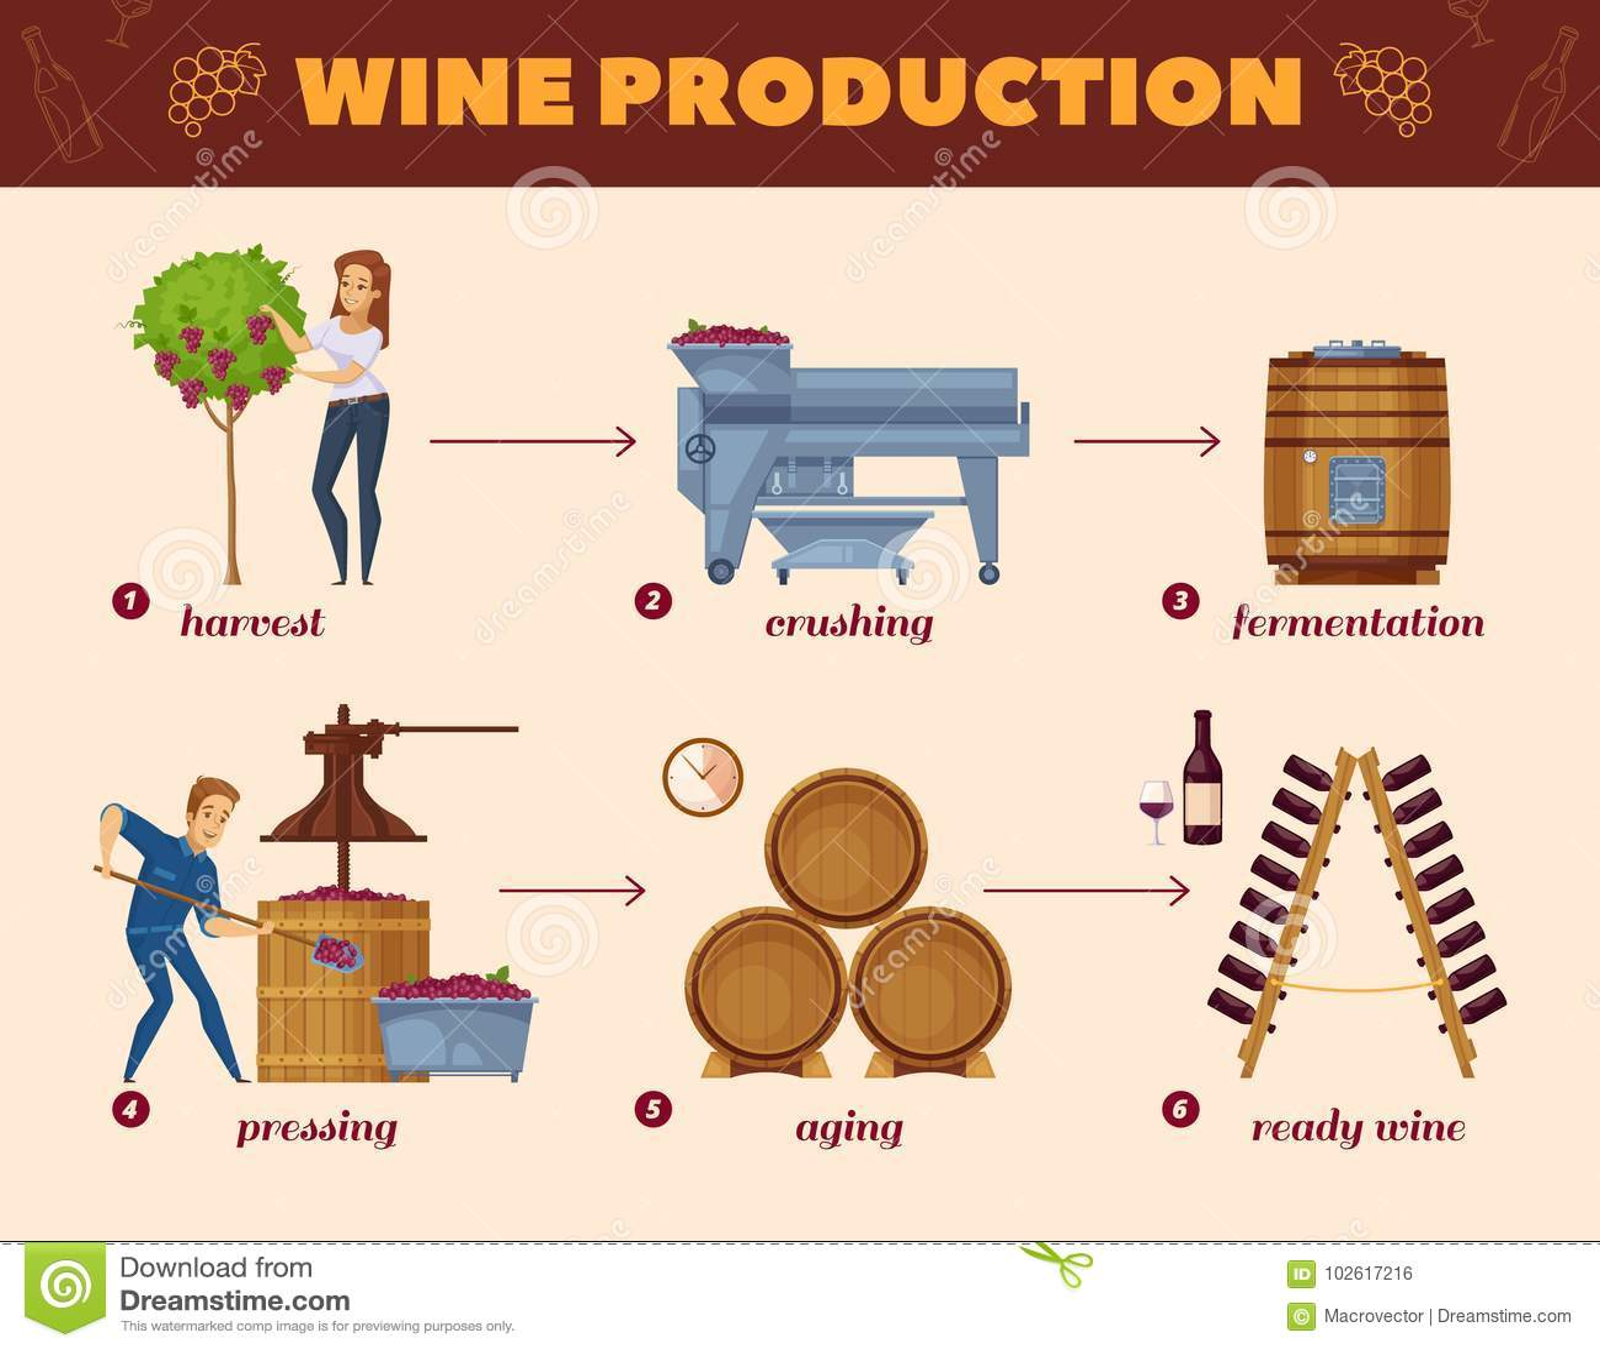 Wine Production Process Cartoon Flowchart